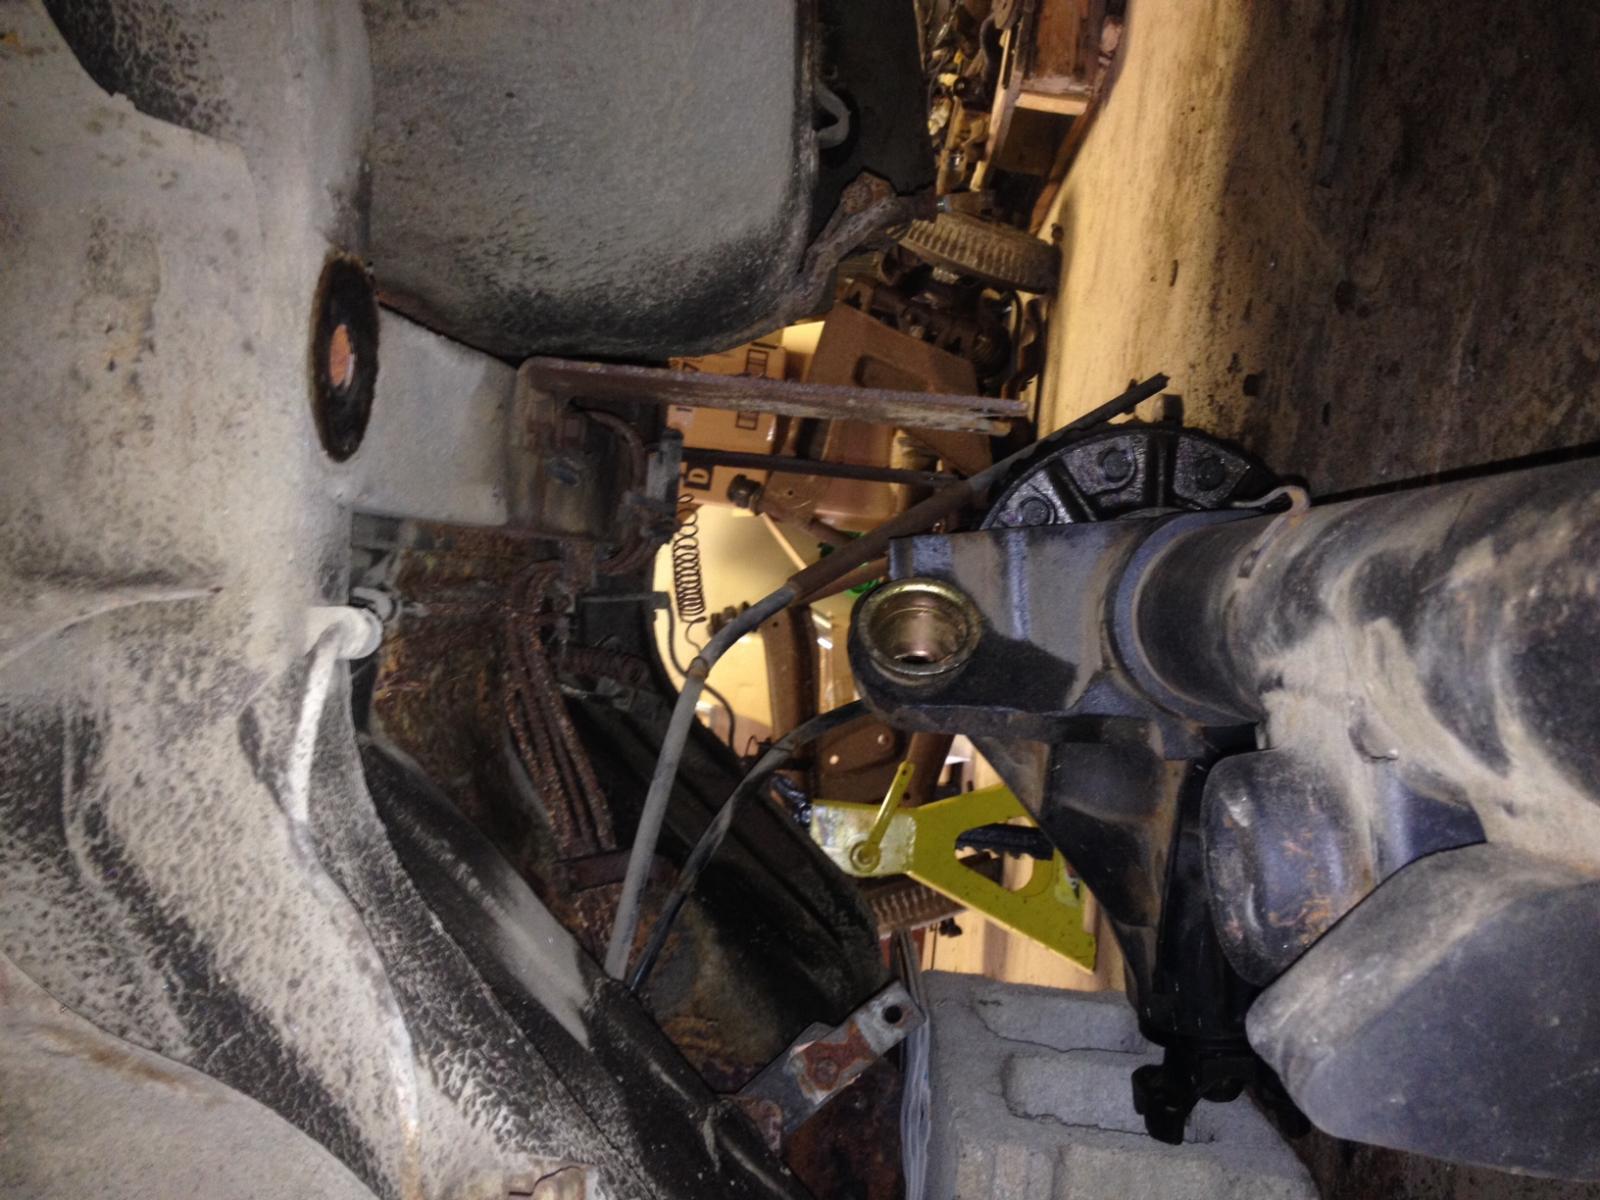 LS 72 Datsun 240Z Rear Differential/Suspension